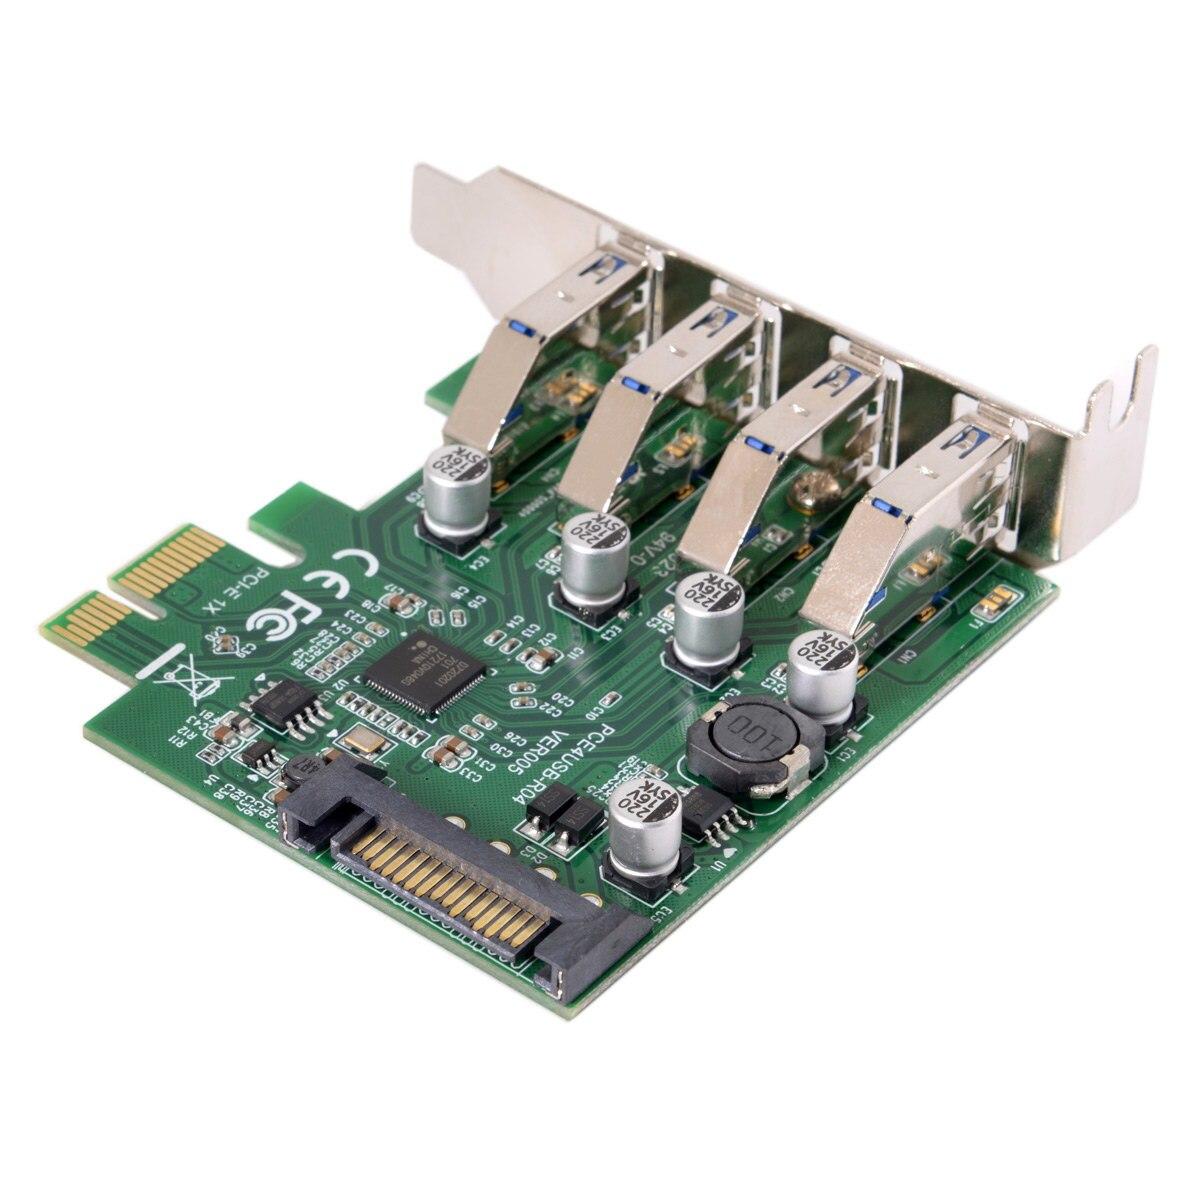 Chenyang bajo perfil 4 puertos PCI-E a USB 3,0 HUB tarjeta de expansión PCI Express adaptador 5Gbps para la placa base